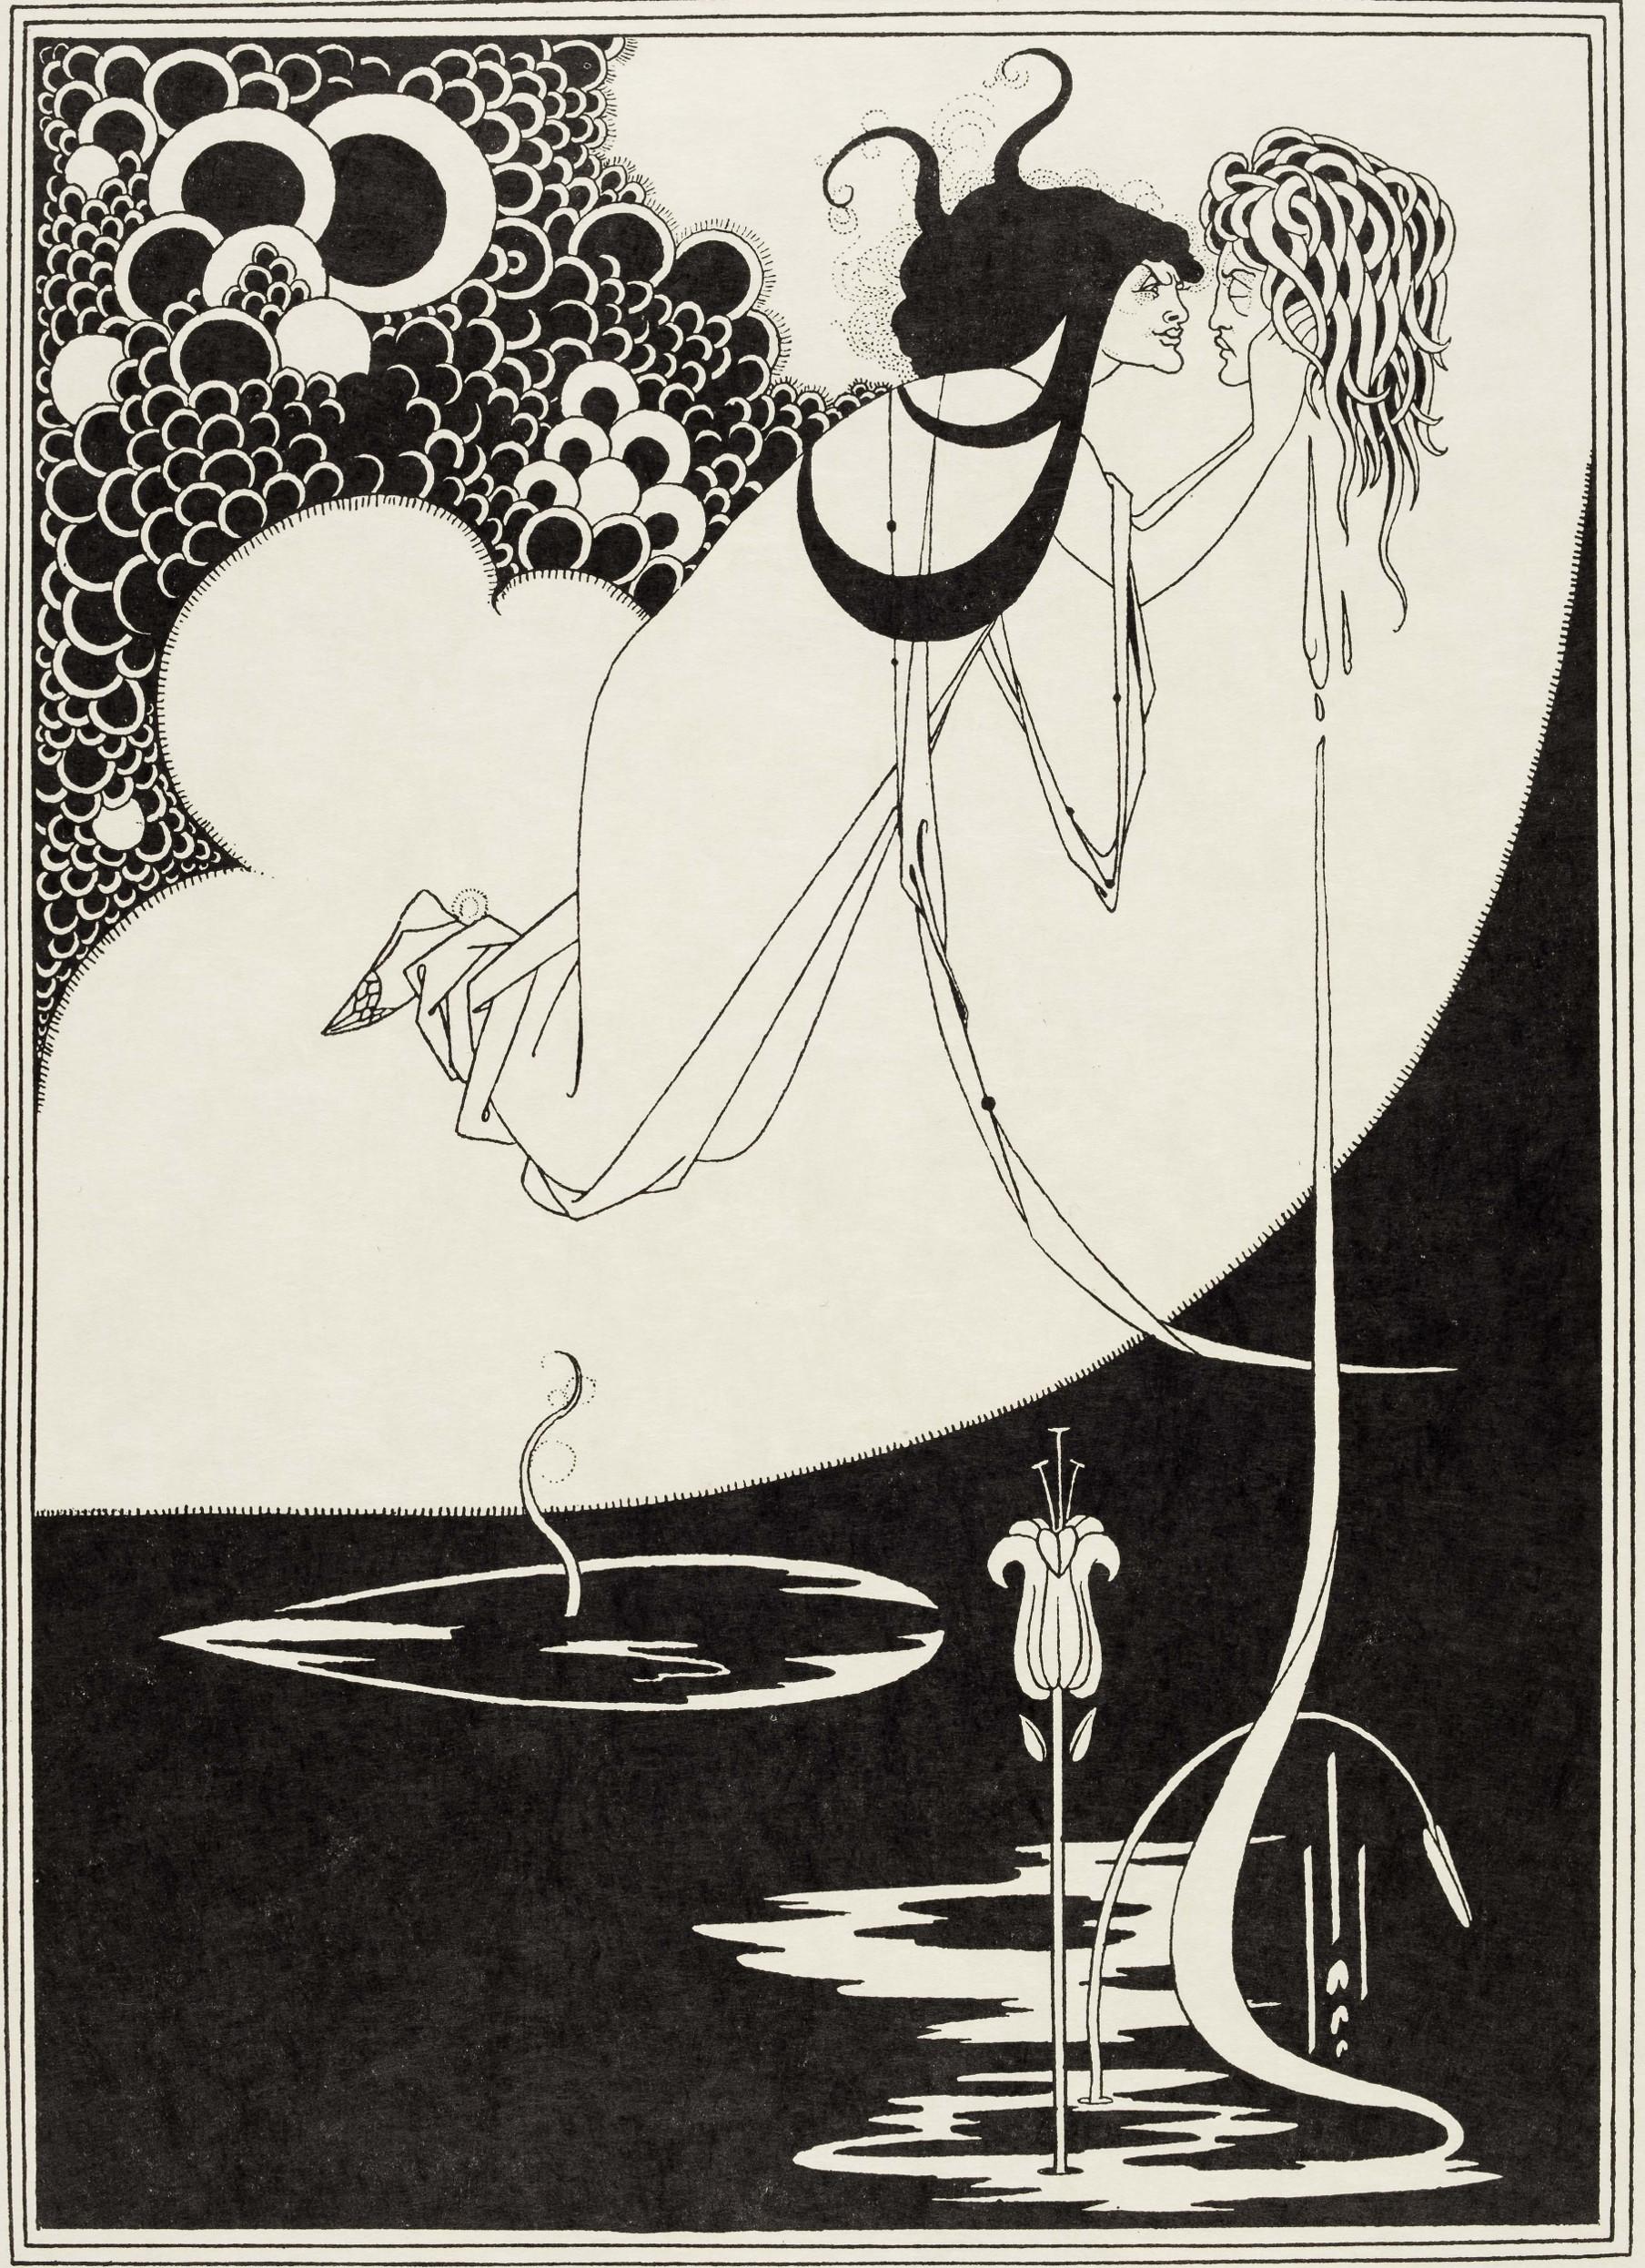 Aubrey Beardsley, J'ai baisé ta bouche Ioka-naan, The Studio, n°1, avril 1893. Collection Merlin Holland